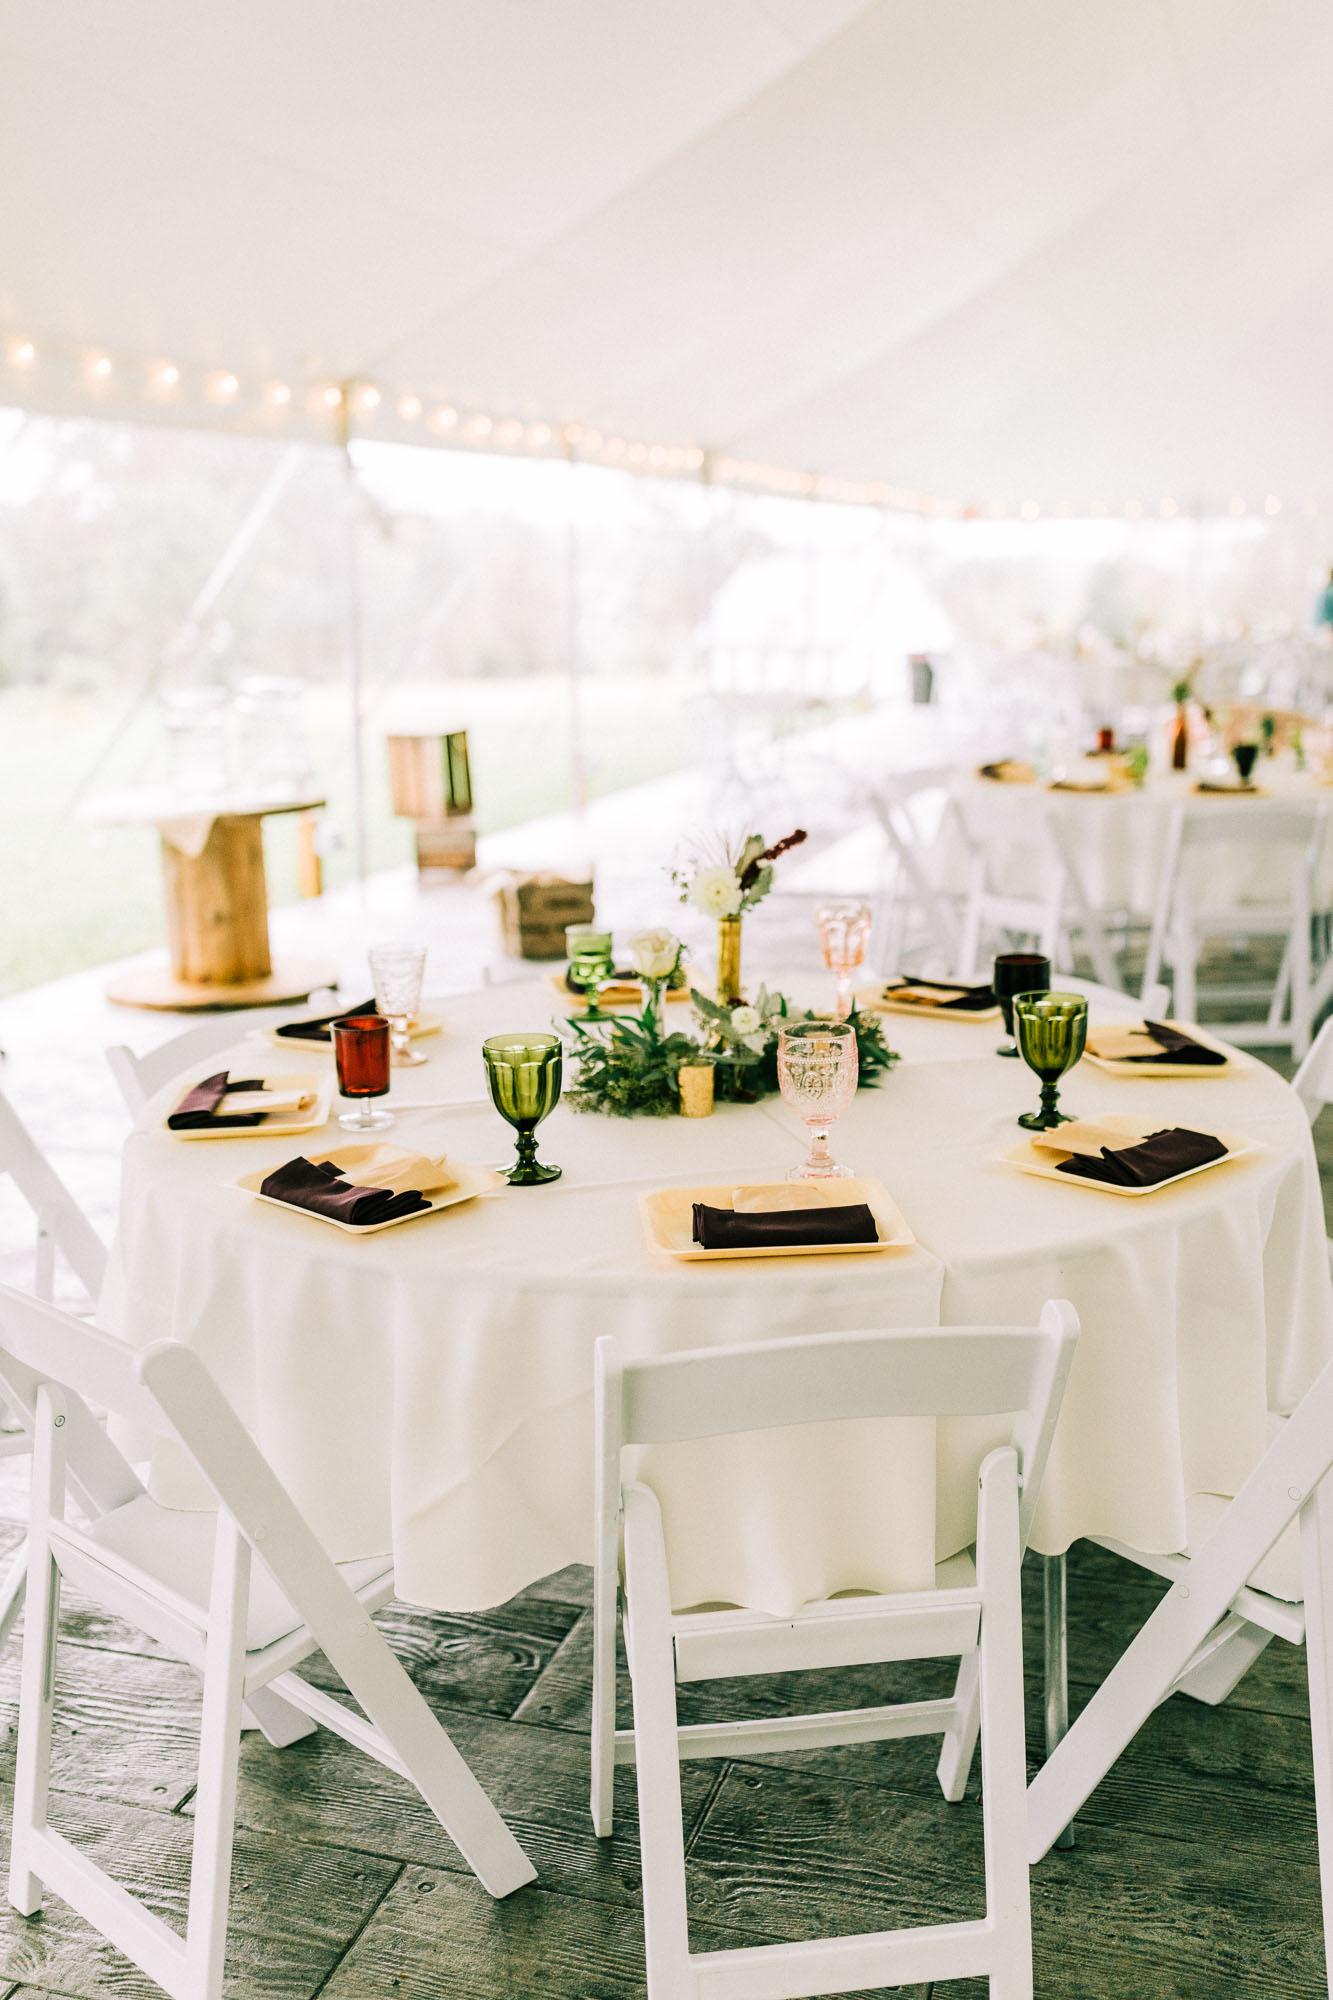 Lodge-at-Raven-Creek-October-wedding-3.jpg